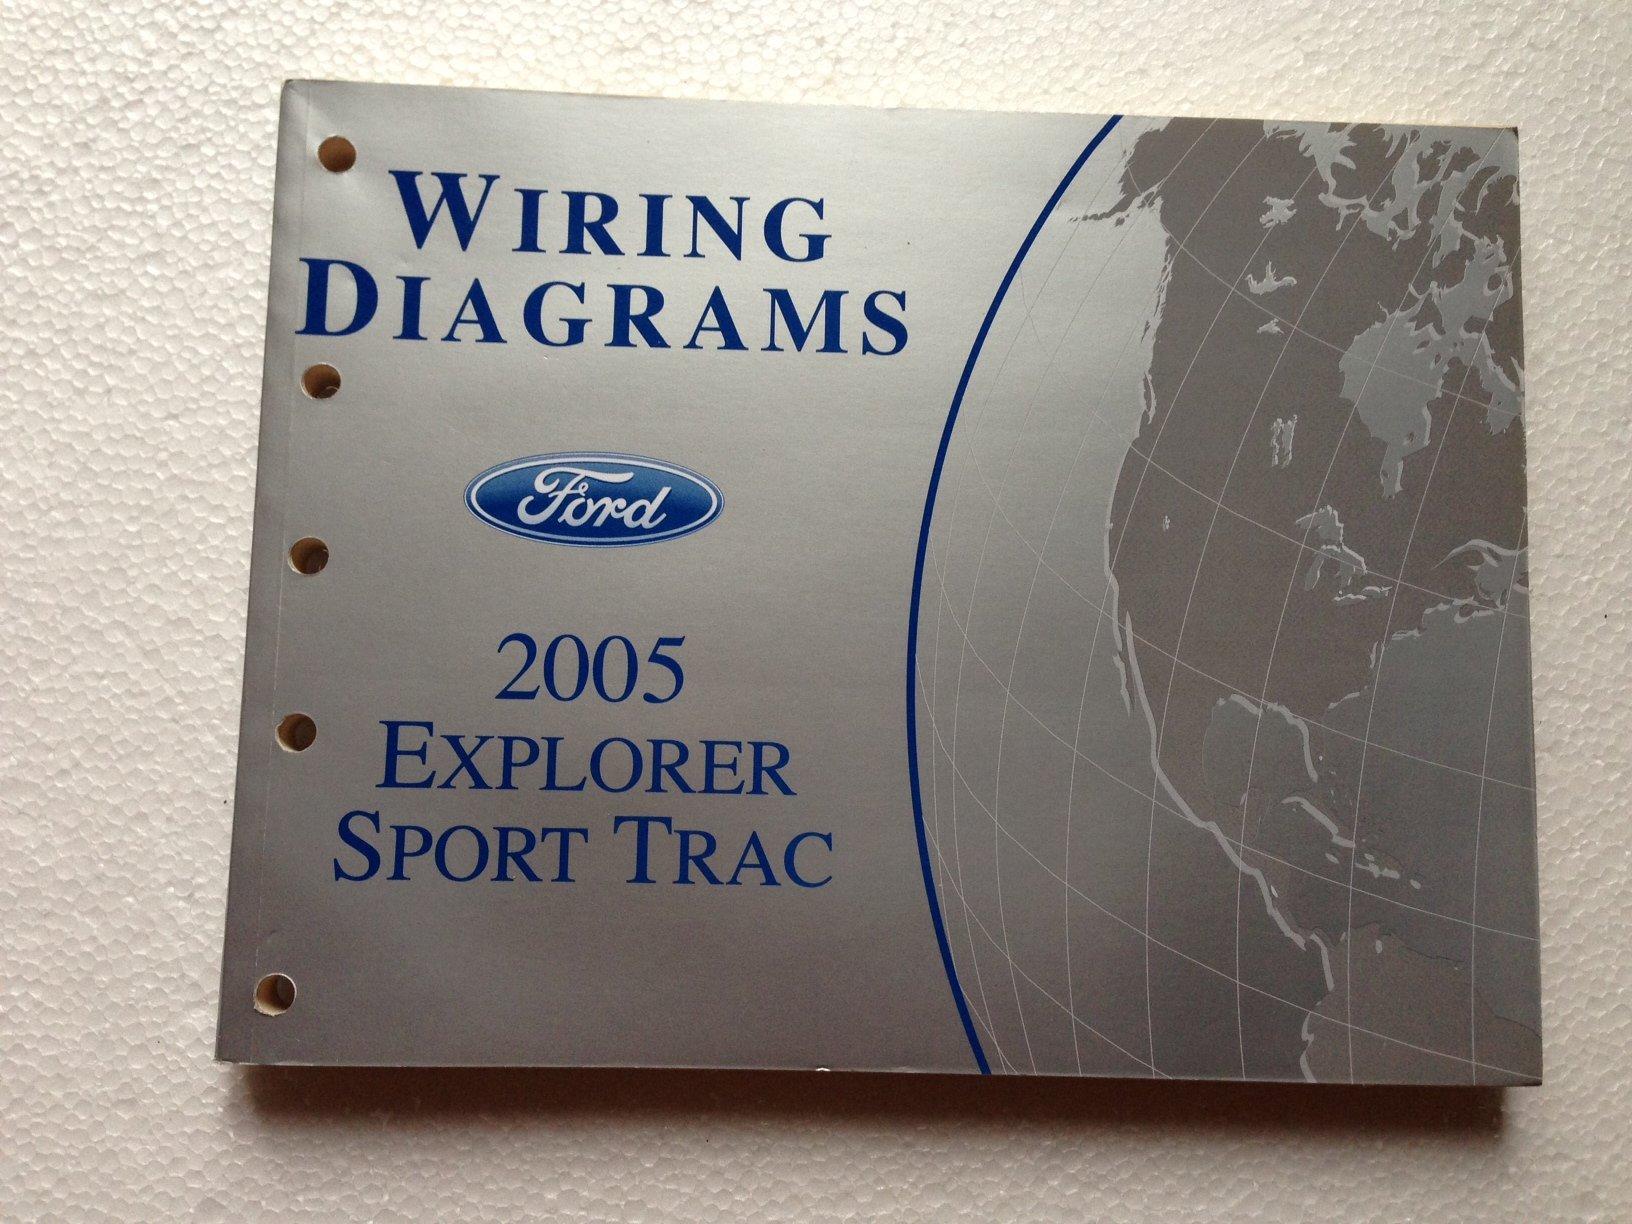 2005 Ford Explorer Sport Trac and Explorer Sport Wiring Diagram Manual: Ford:  Amazon.com: BooksAmazon.com